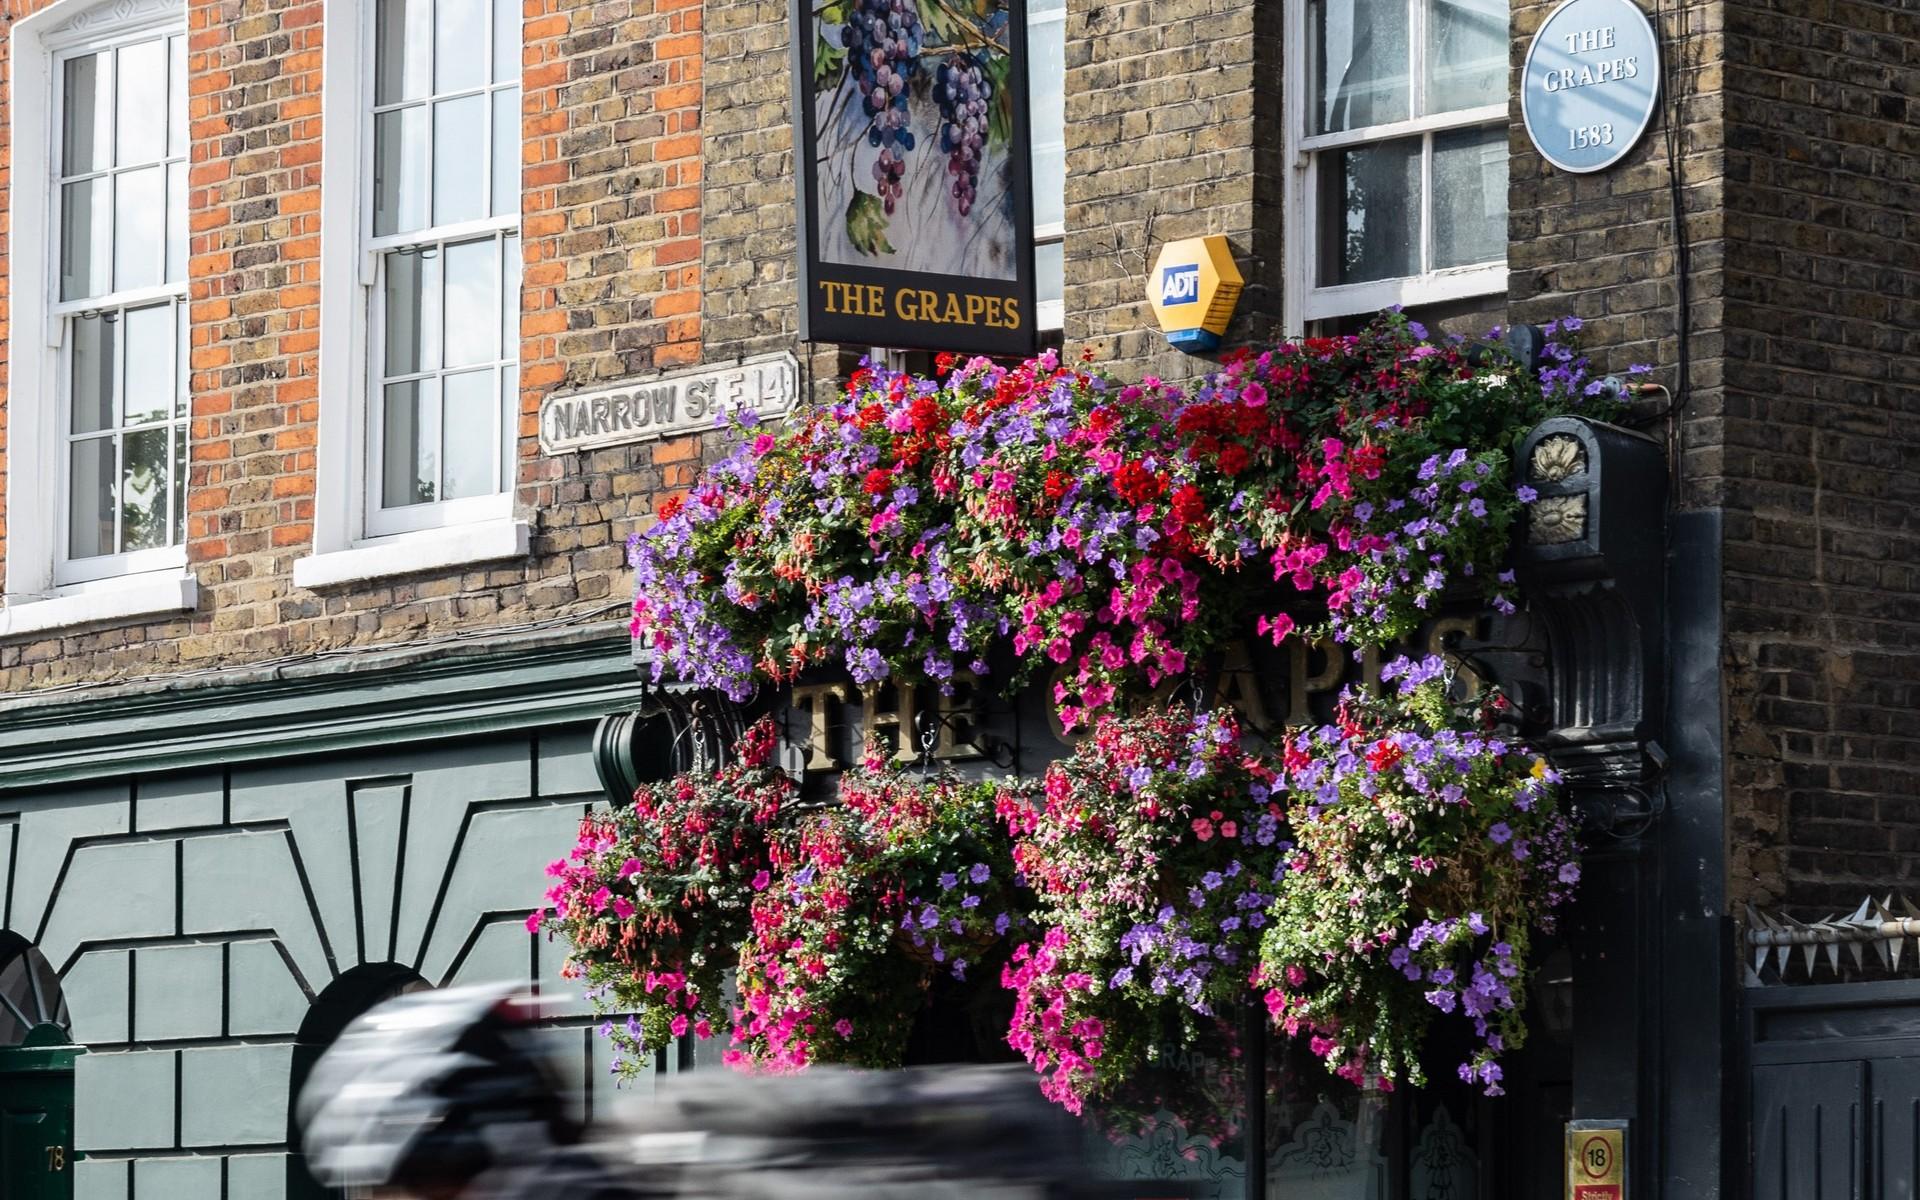 The Grapes Public House, Narrow Street, Limehouse E14